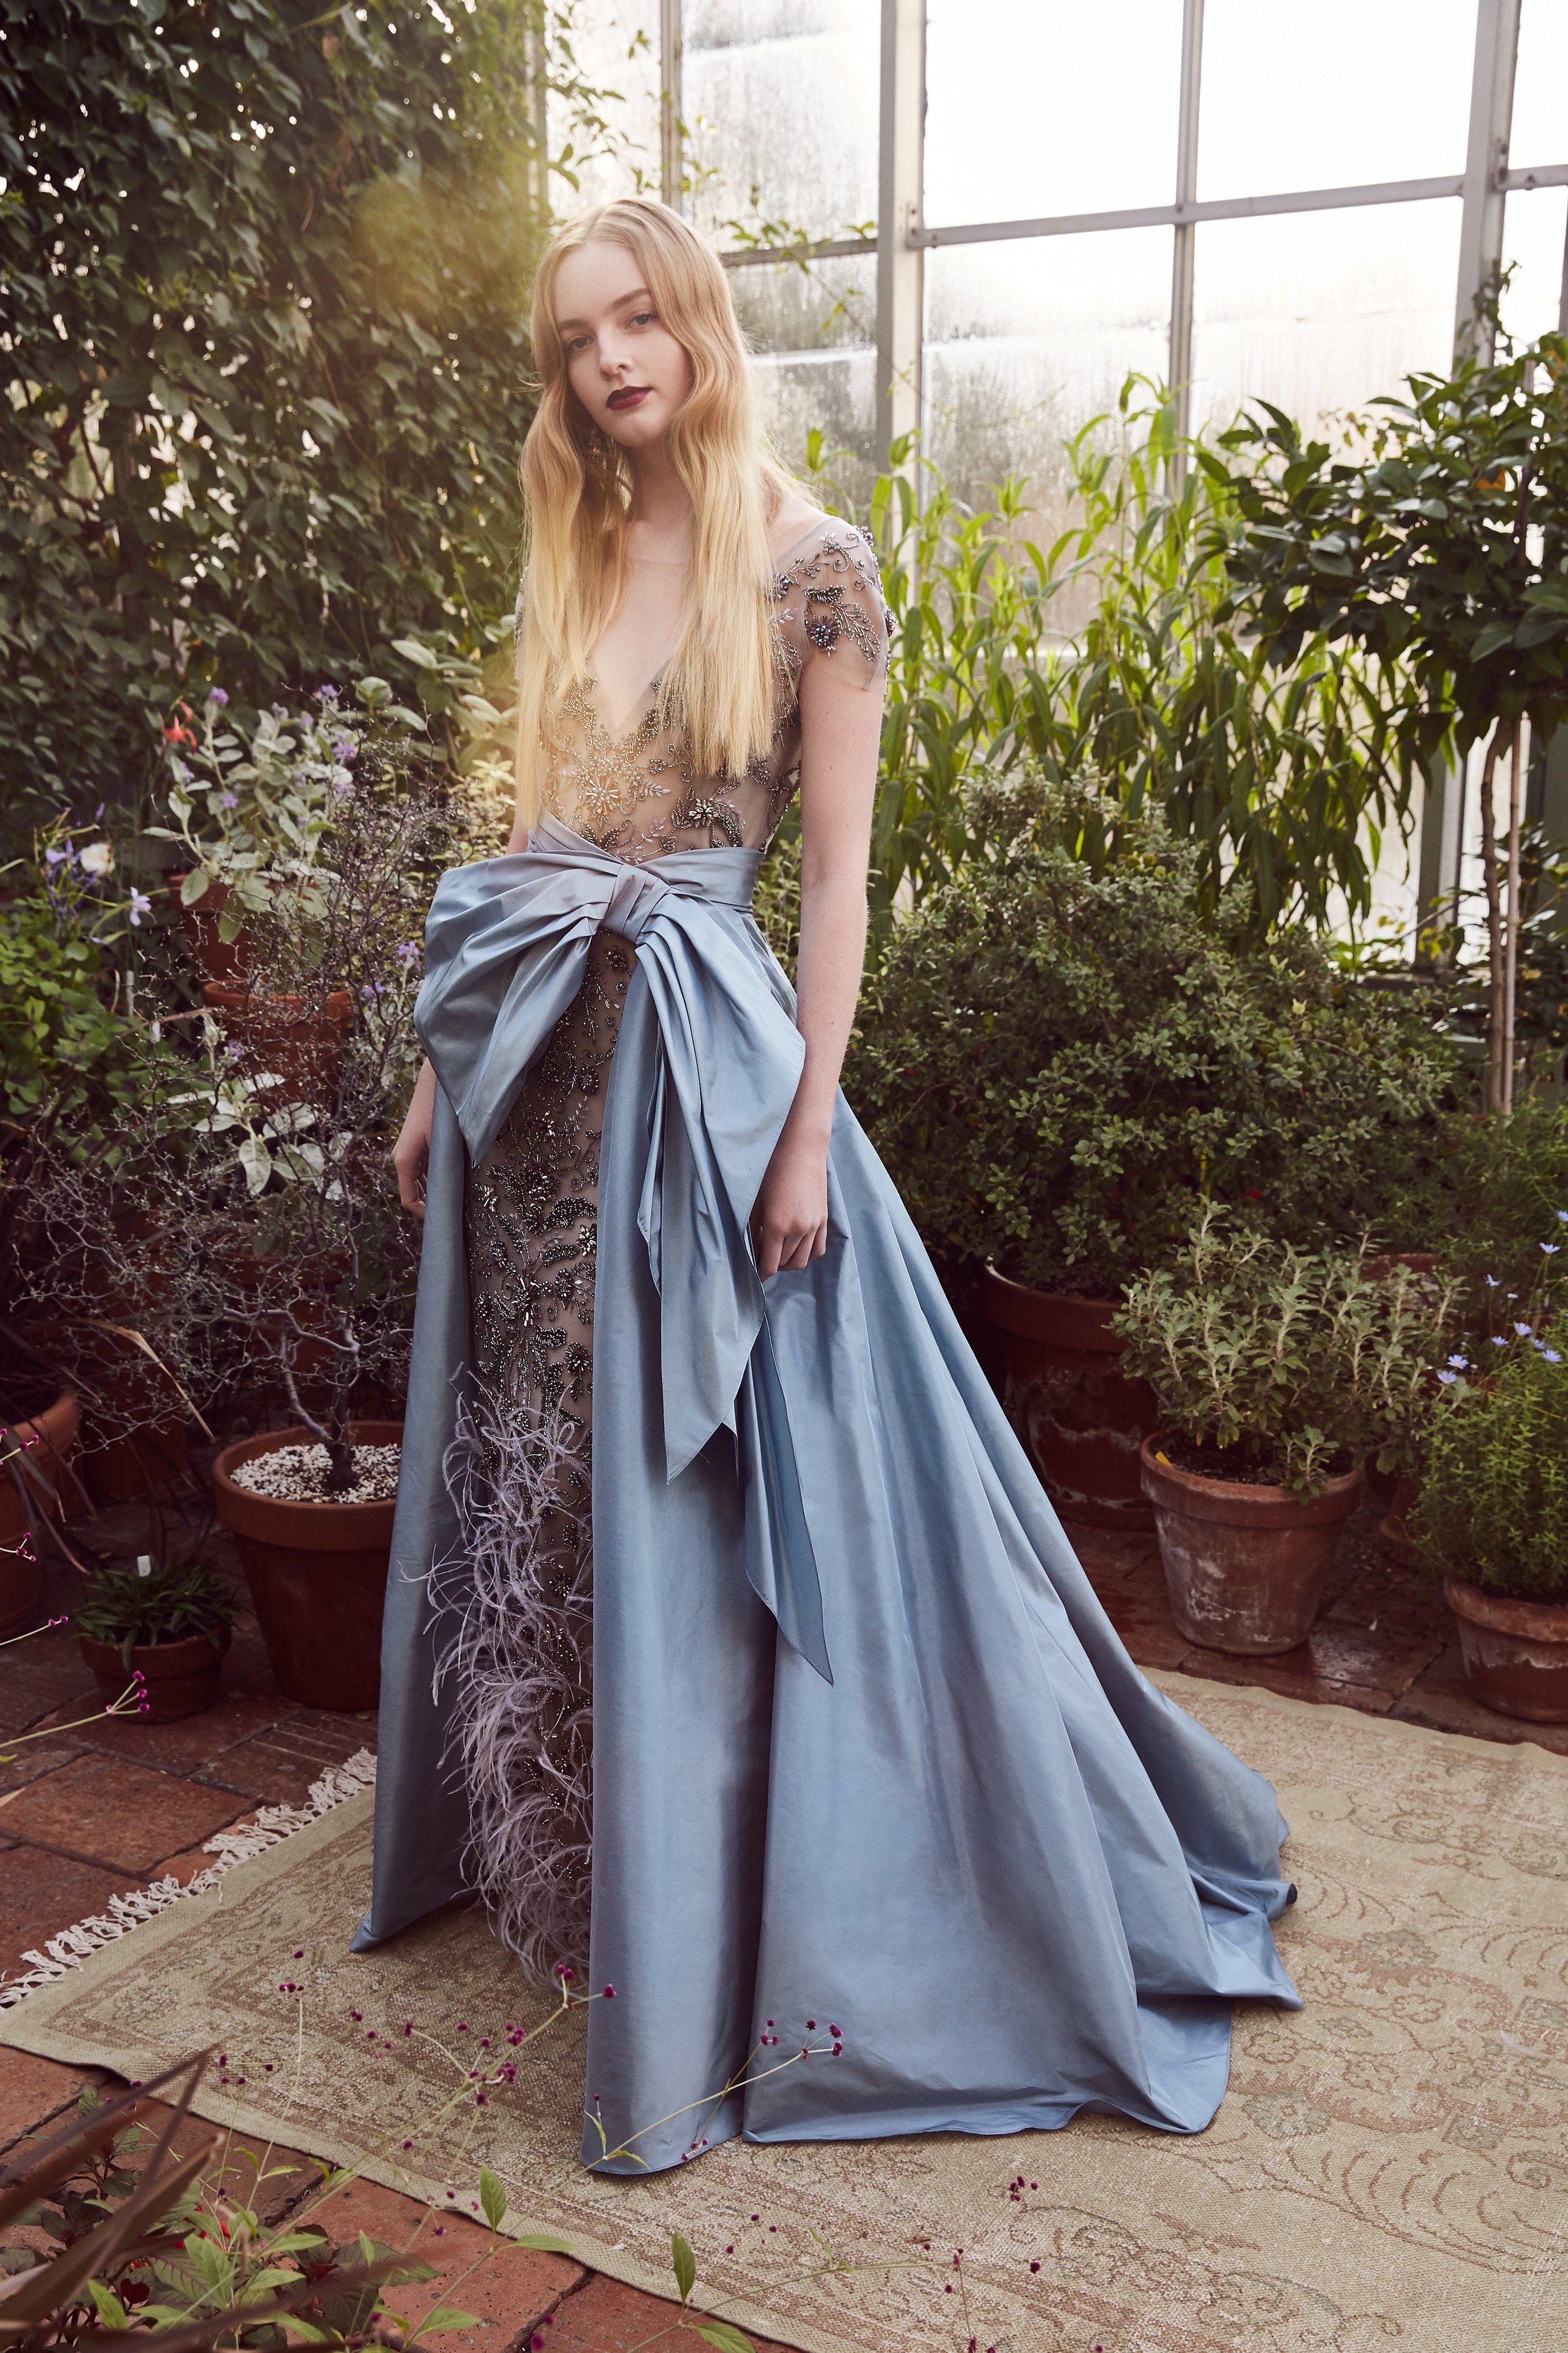 e189b860492 Marchesa Pre-Fall 2019 Fashion Show in 2019 | Pre-Fall 2019 | Autumn ...